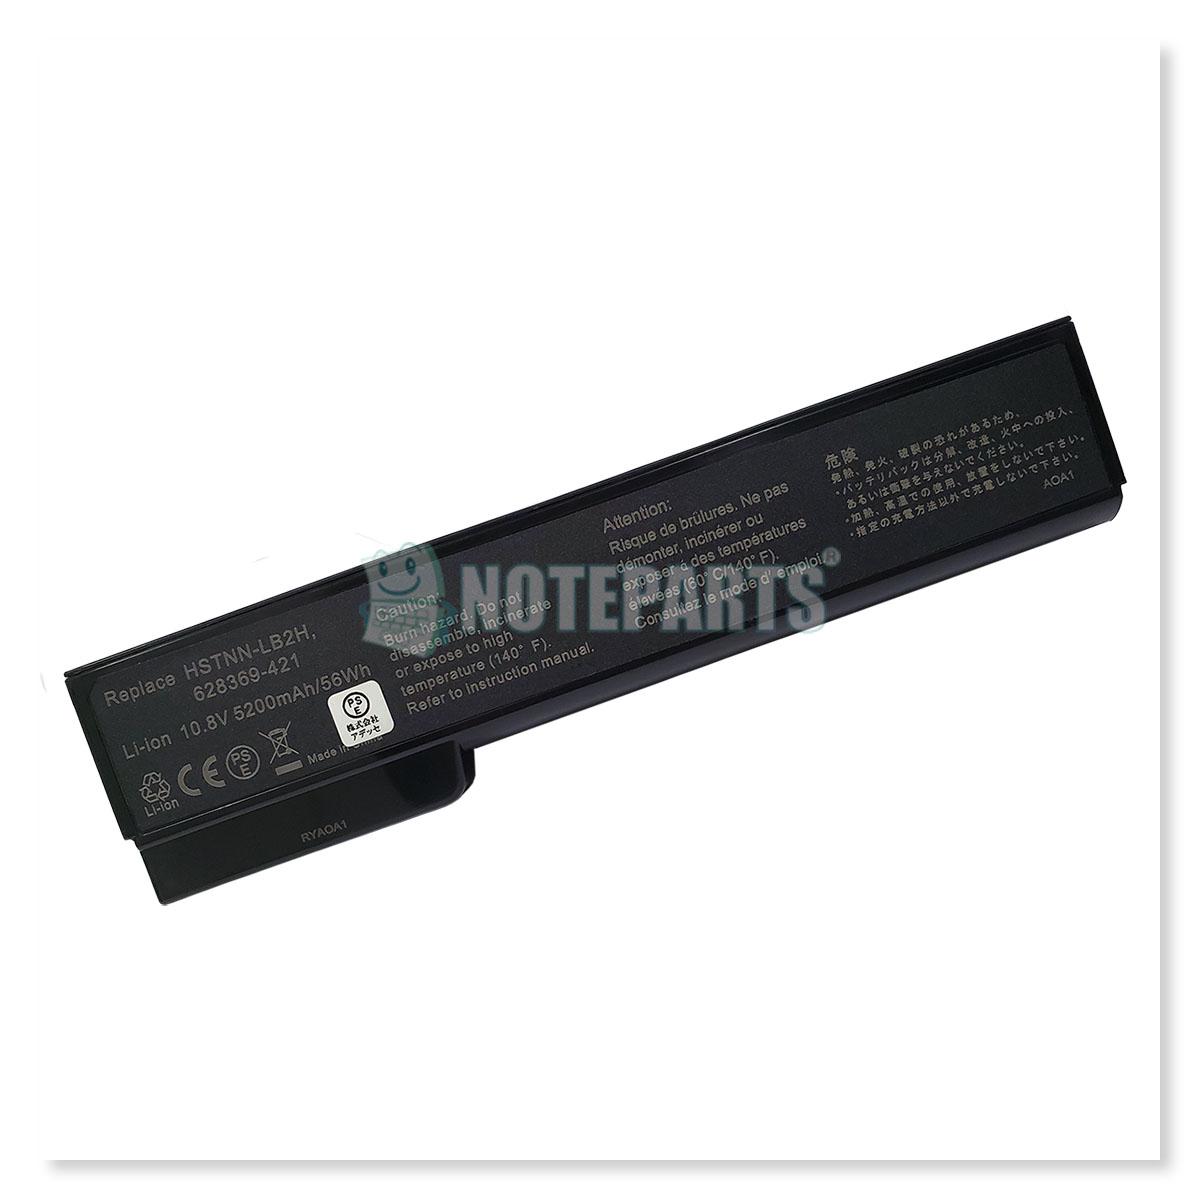 HP ProBook 6560b 6570b EliteBook 8460p 8560p バッテリー QK642AA 628664-001 CC06対応